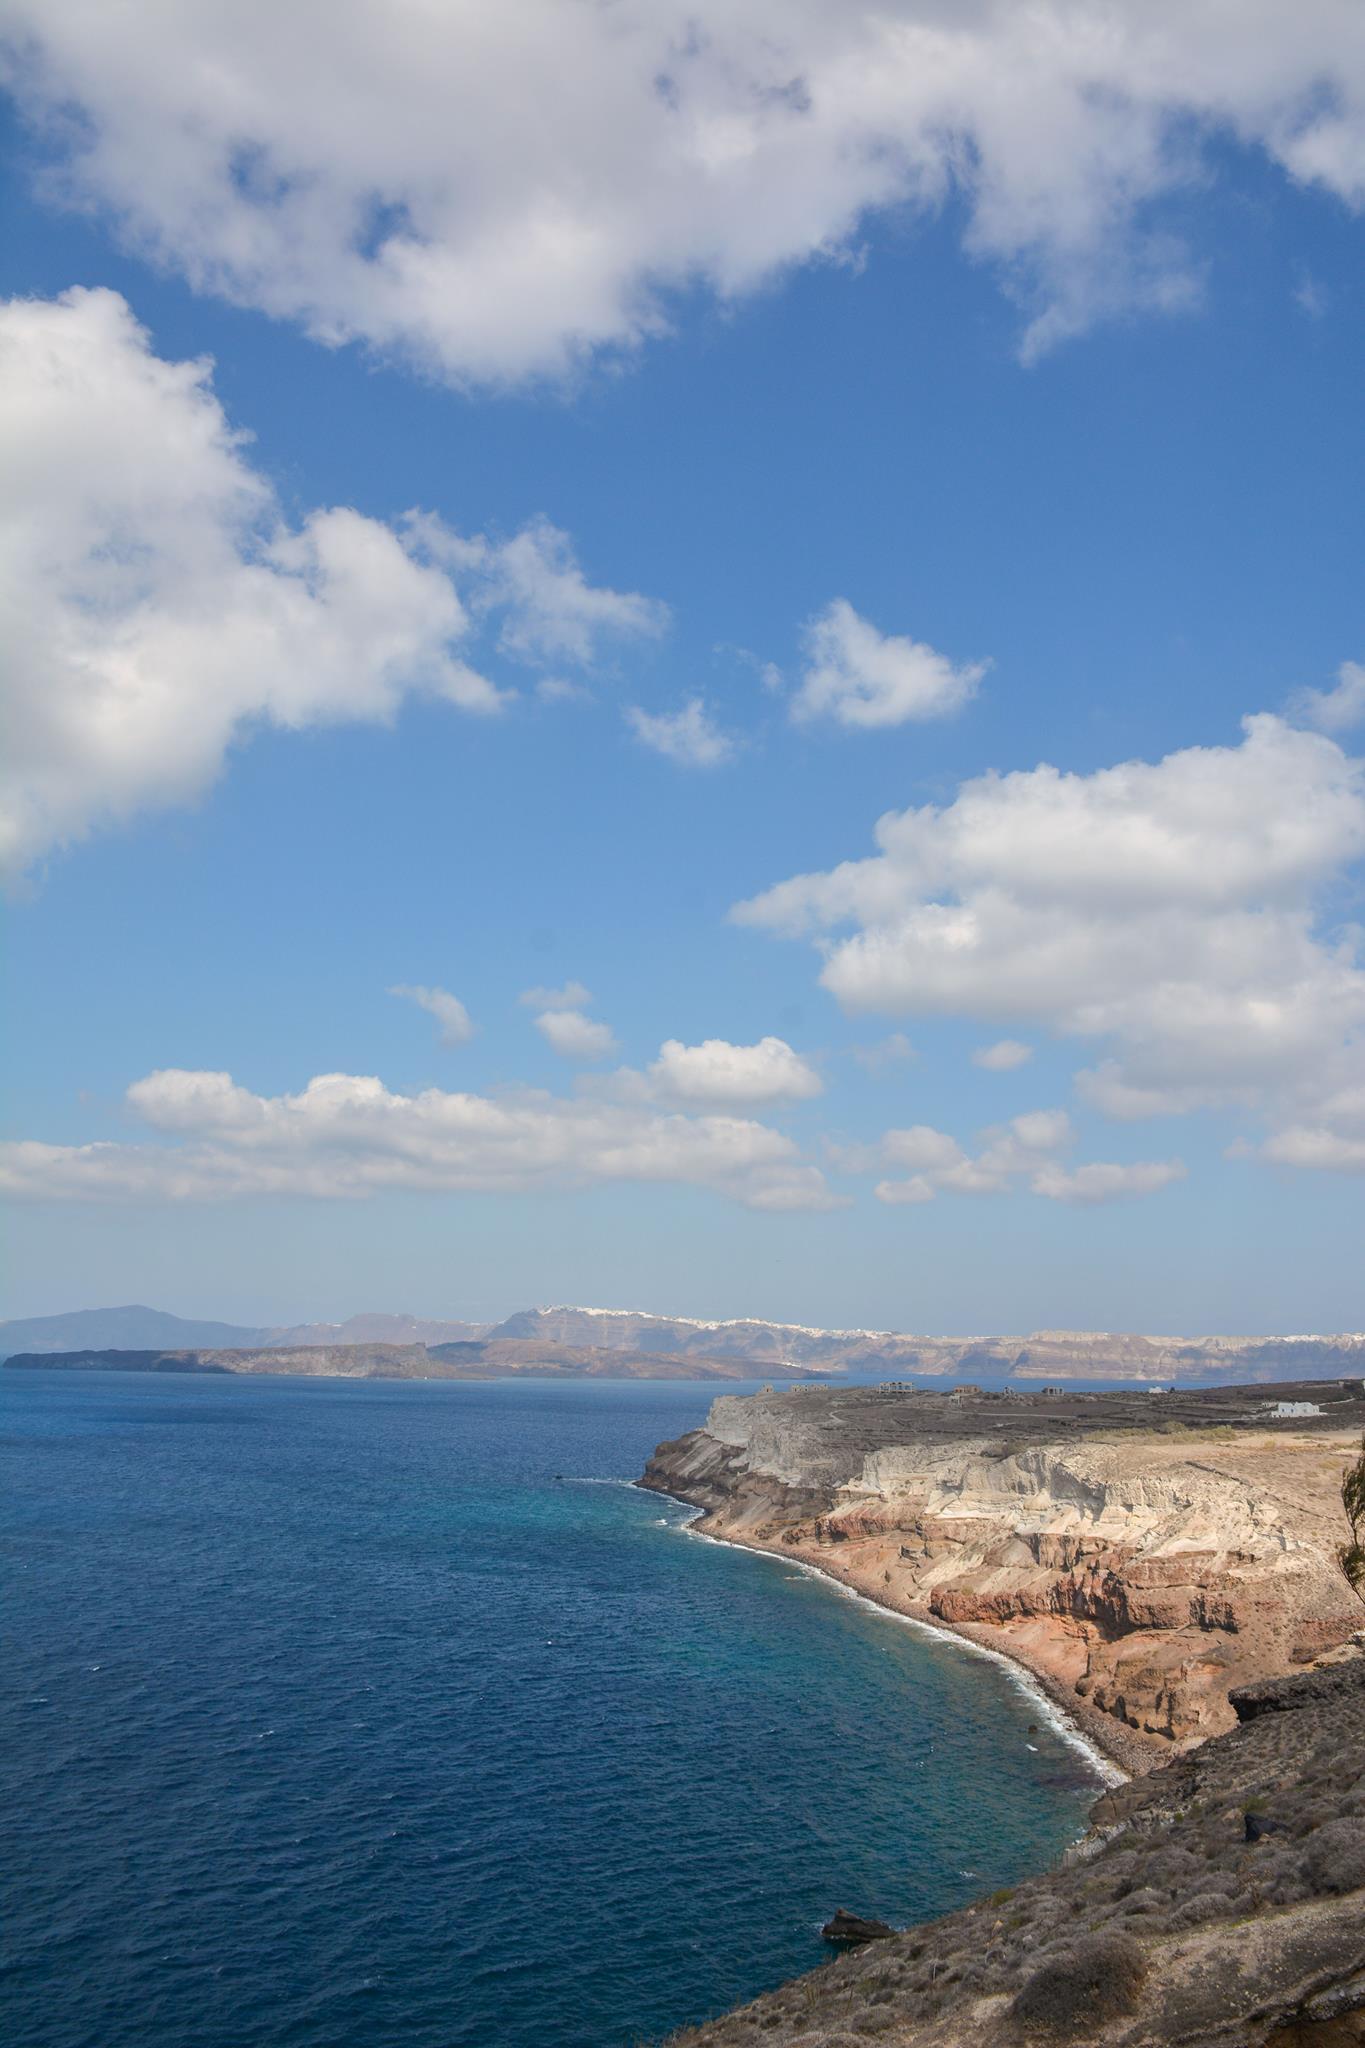 Santorini: A Photo Diary by Chris (16)